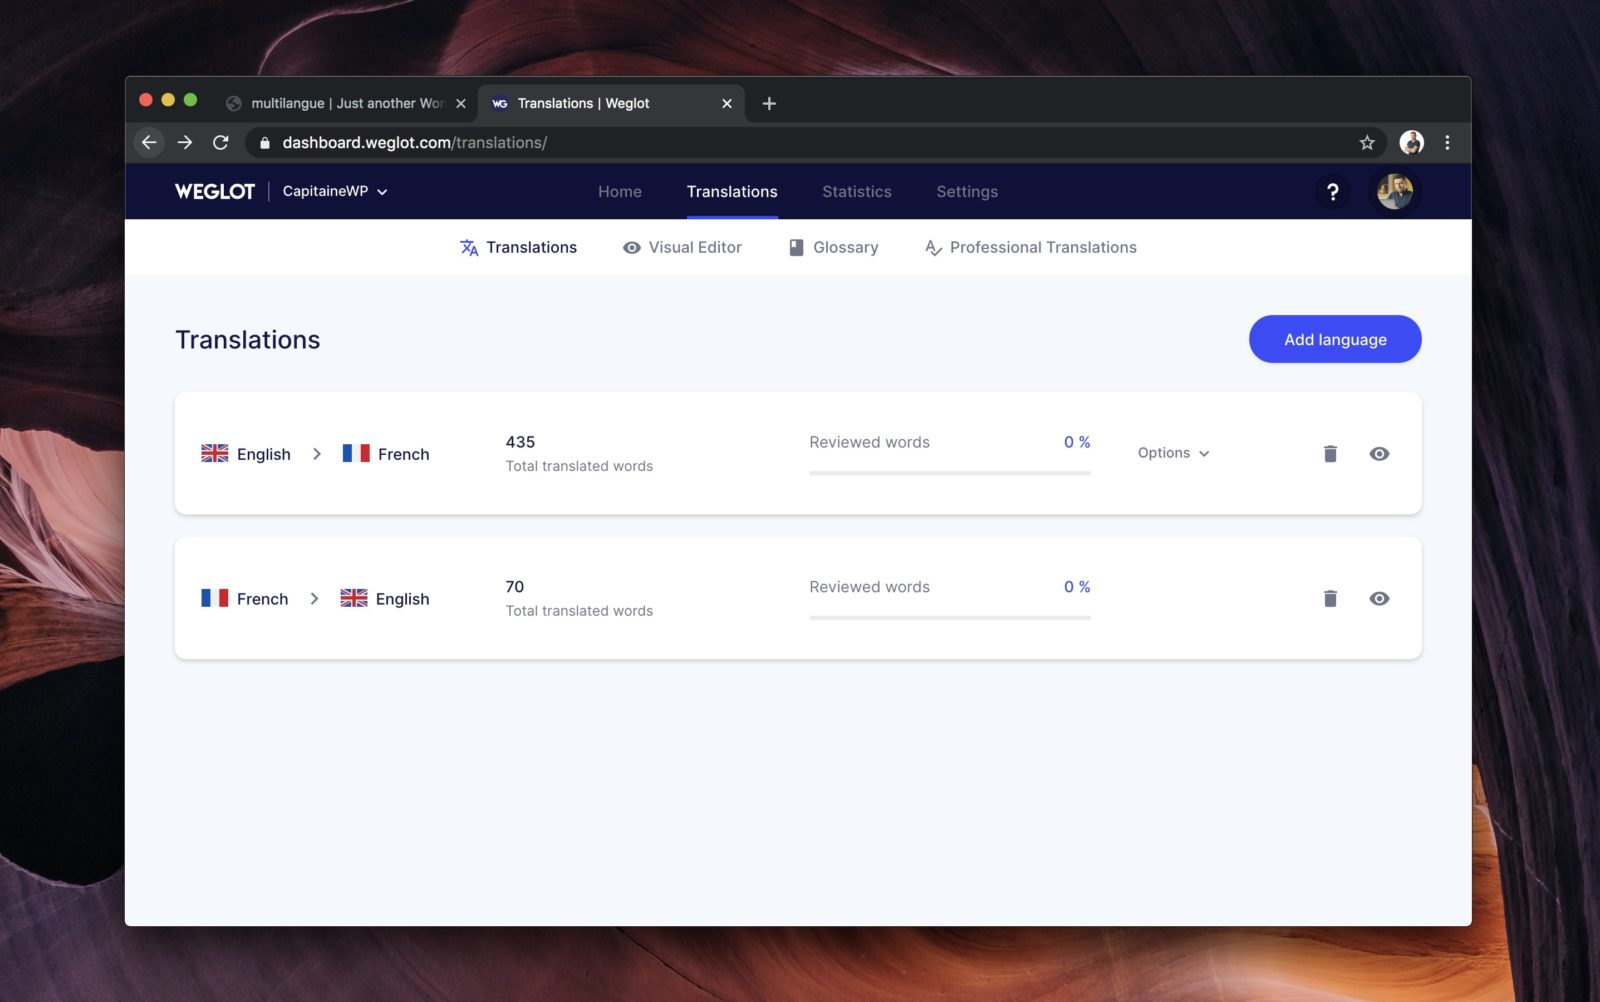 Capture d'écran de l'interface des langues de Weglot